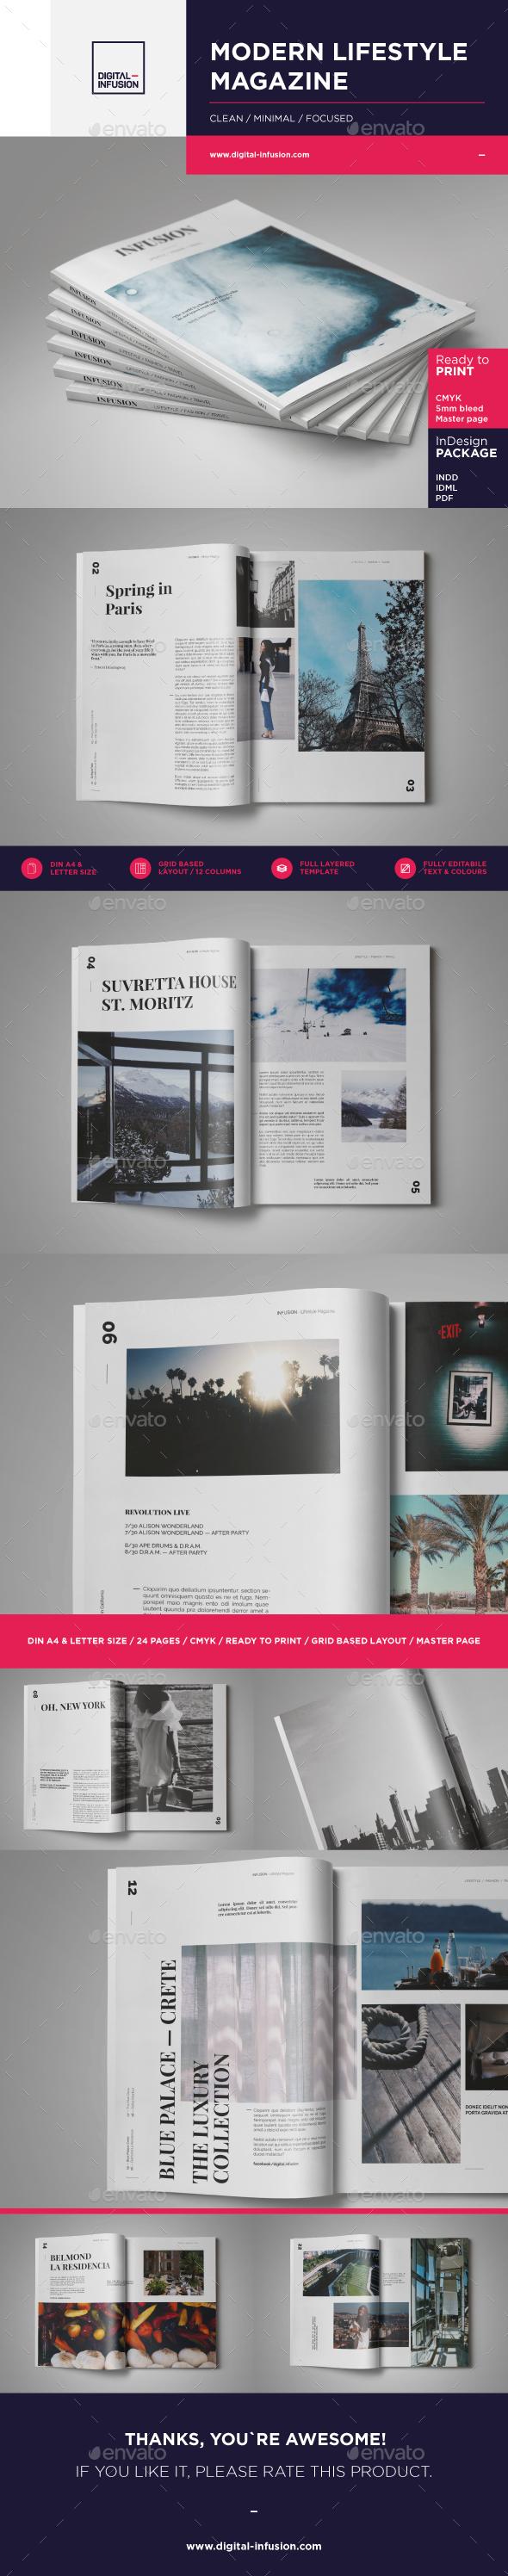 Infusion — Modern Lifestyle Magazine - Magazines Print Templates